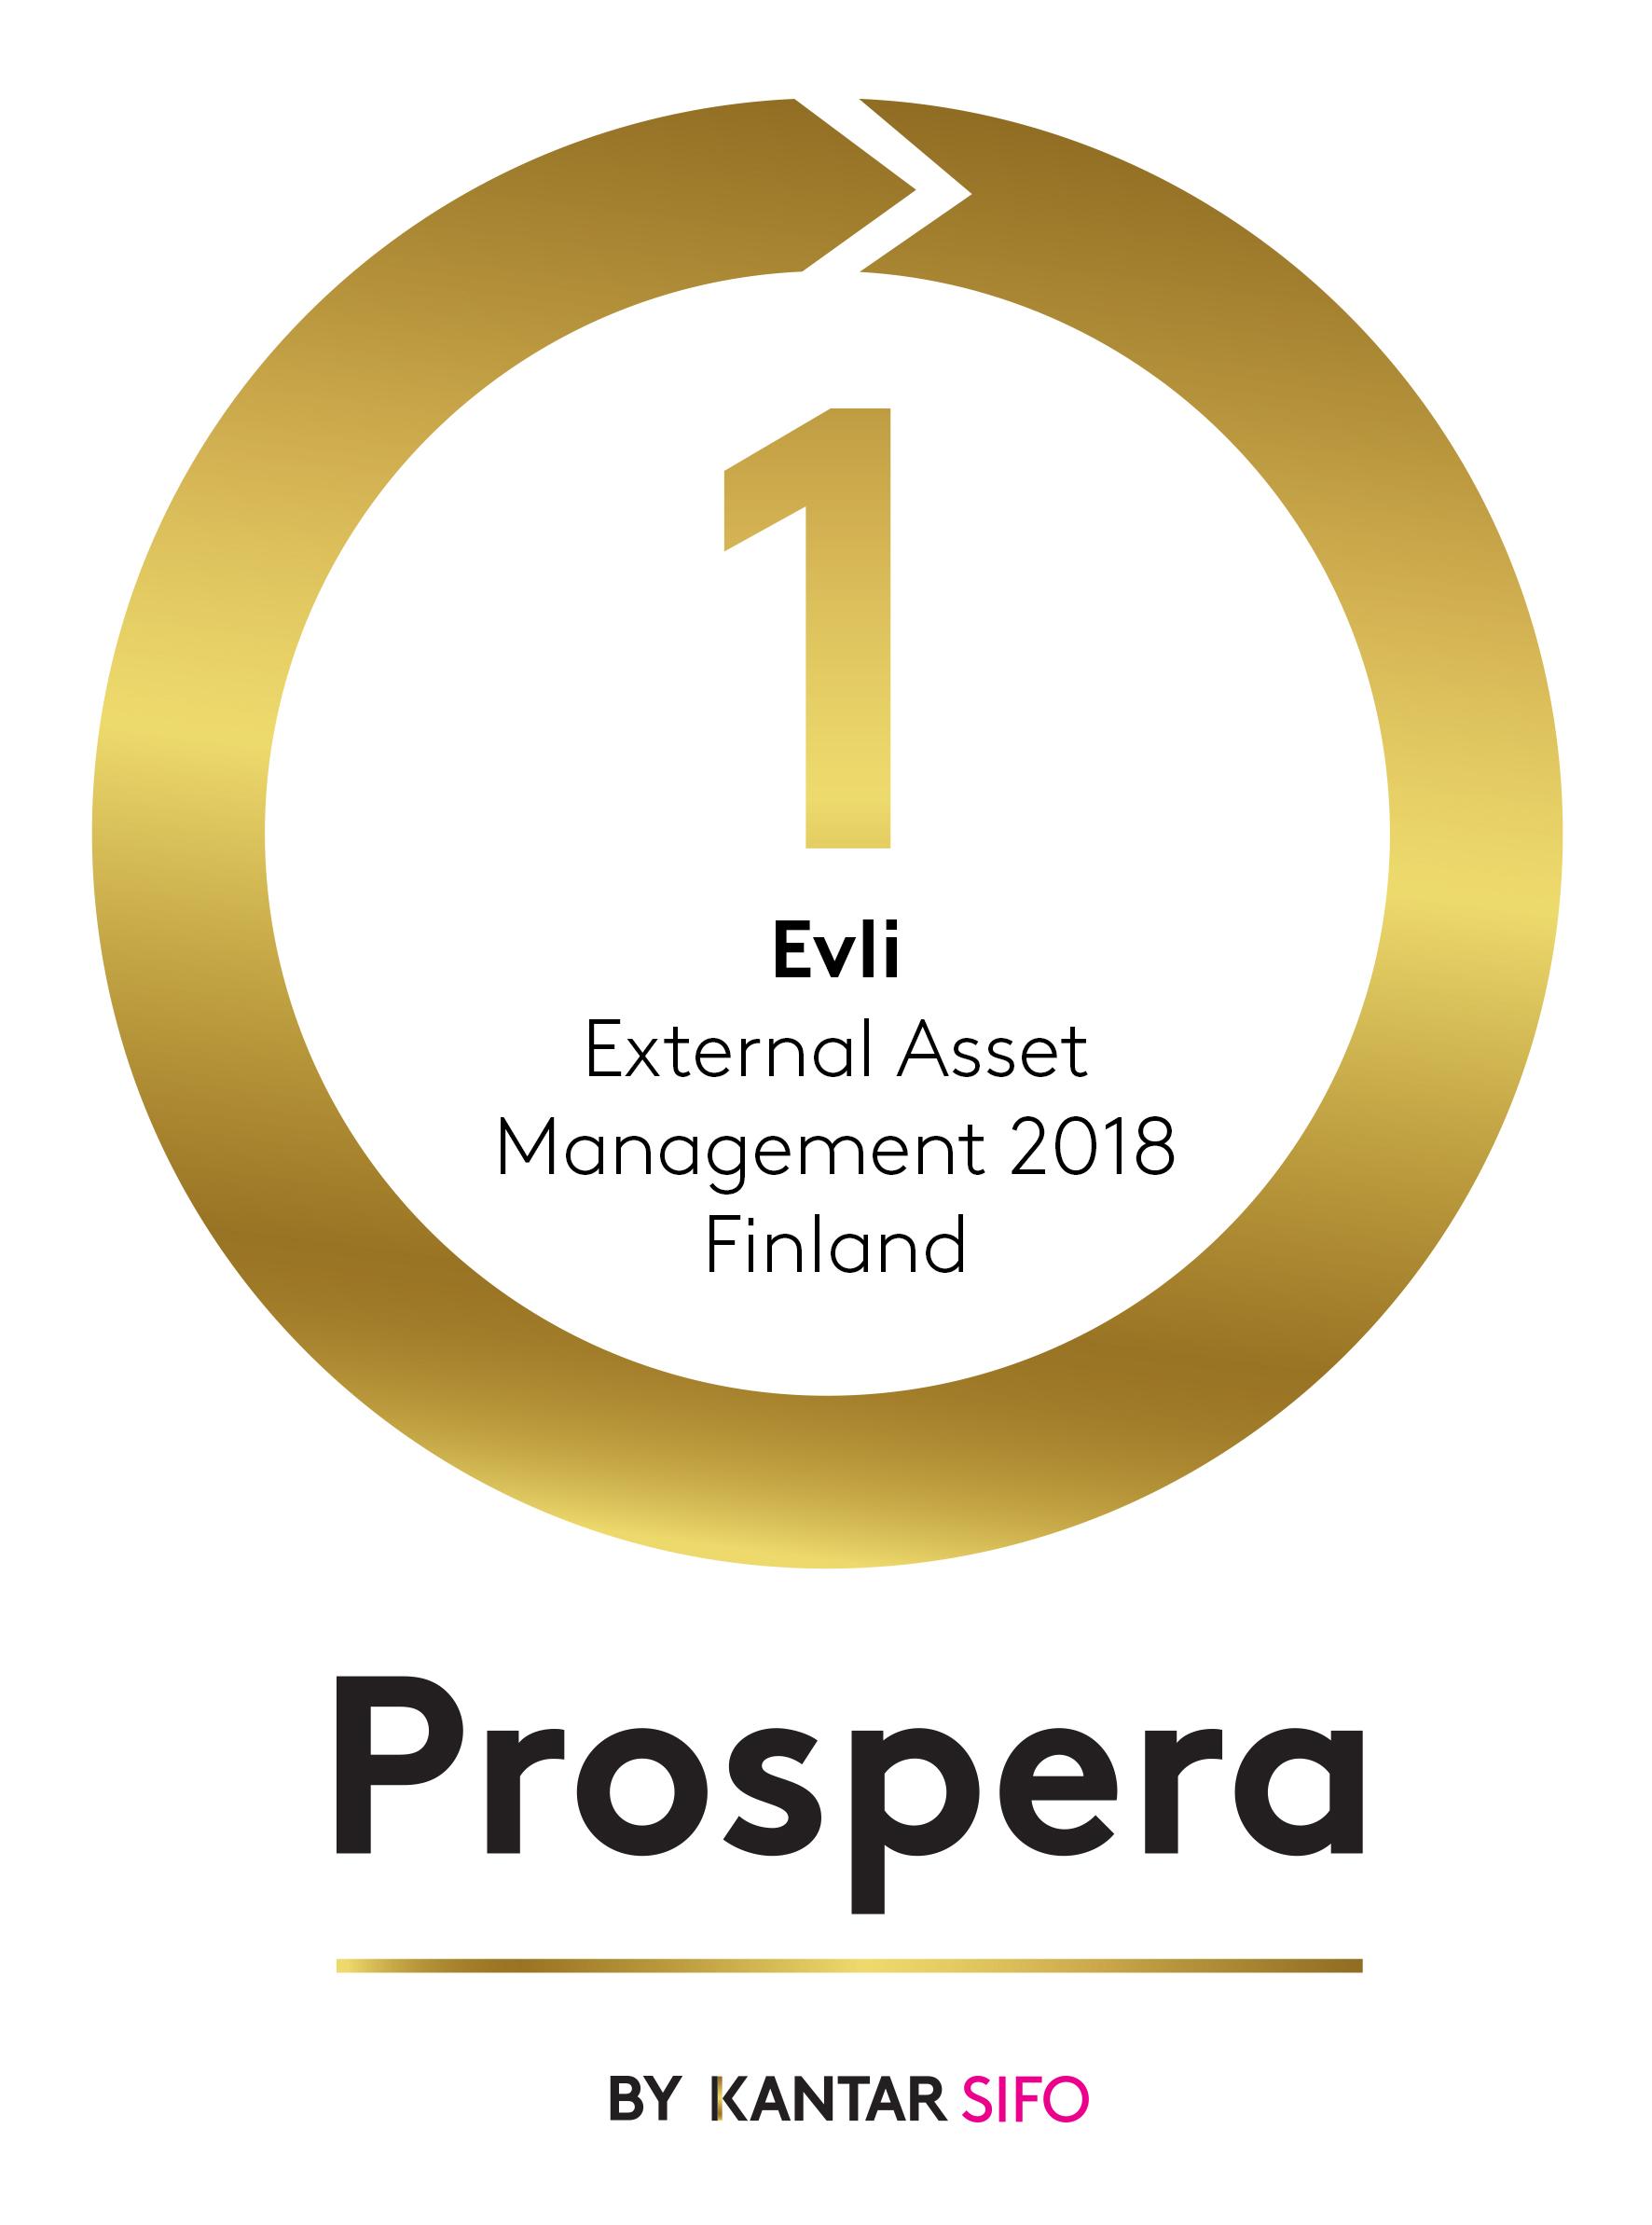 Evli Suomi Pienyhtiöt B